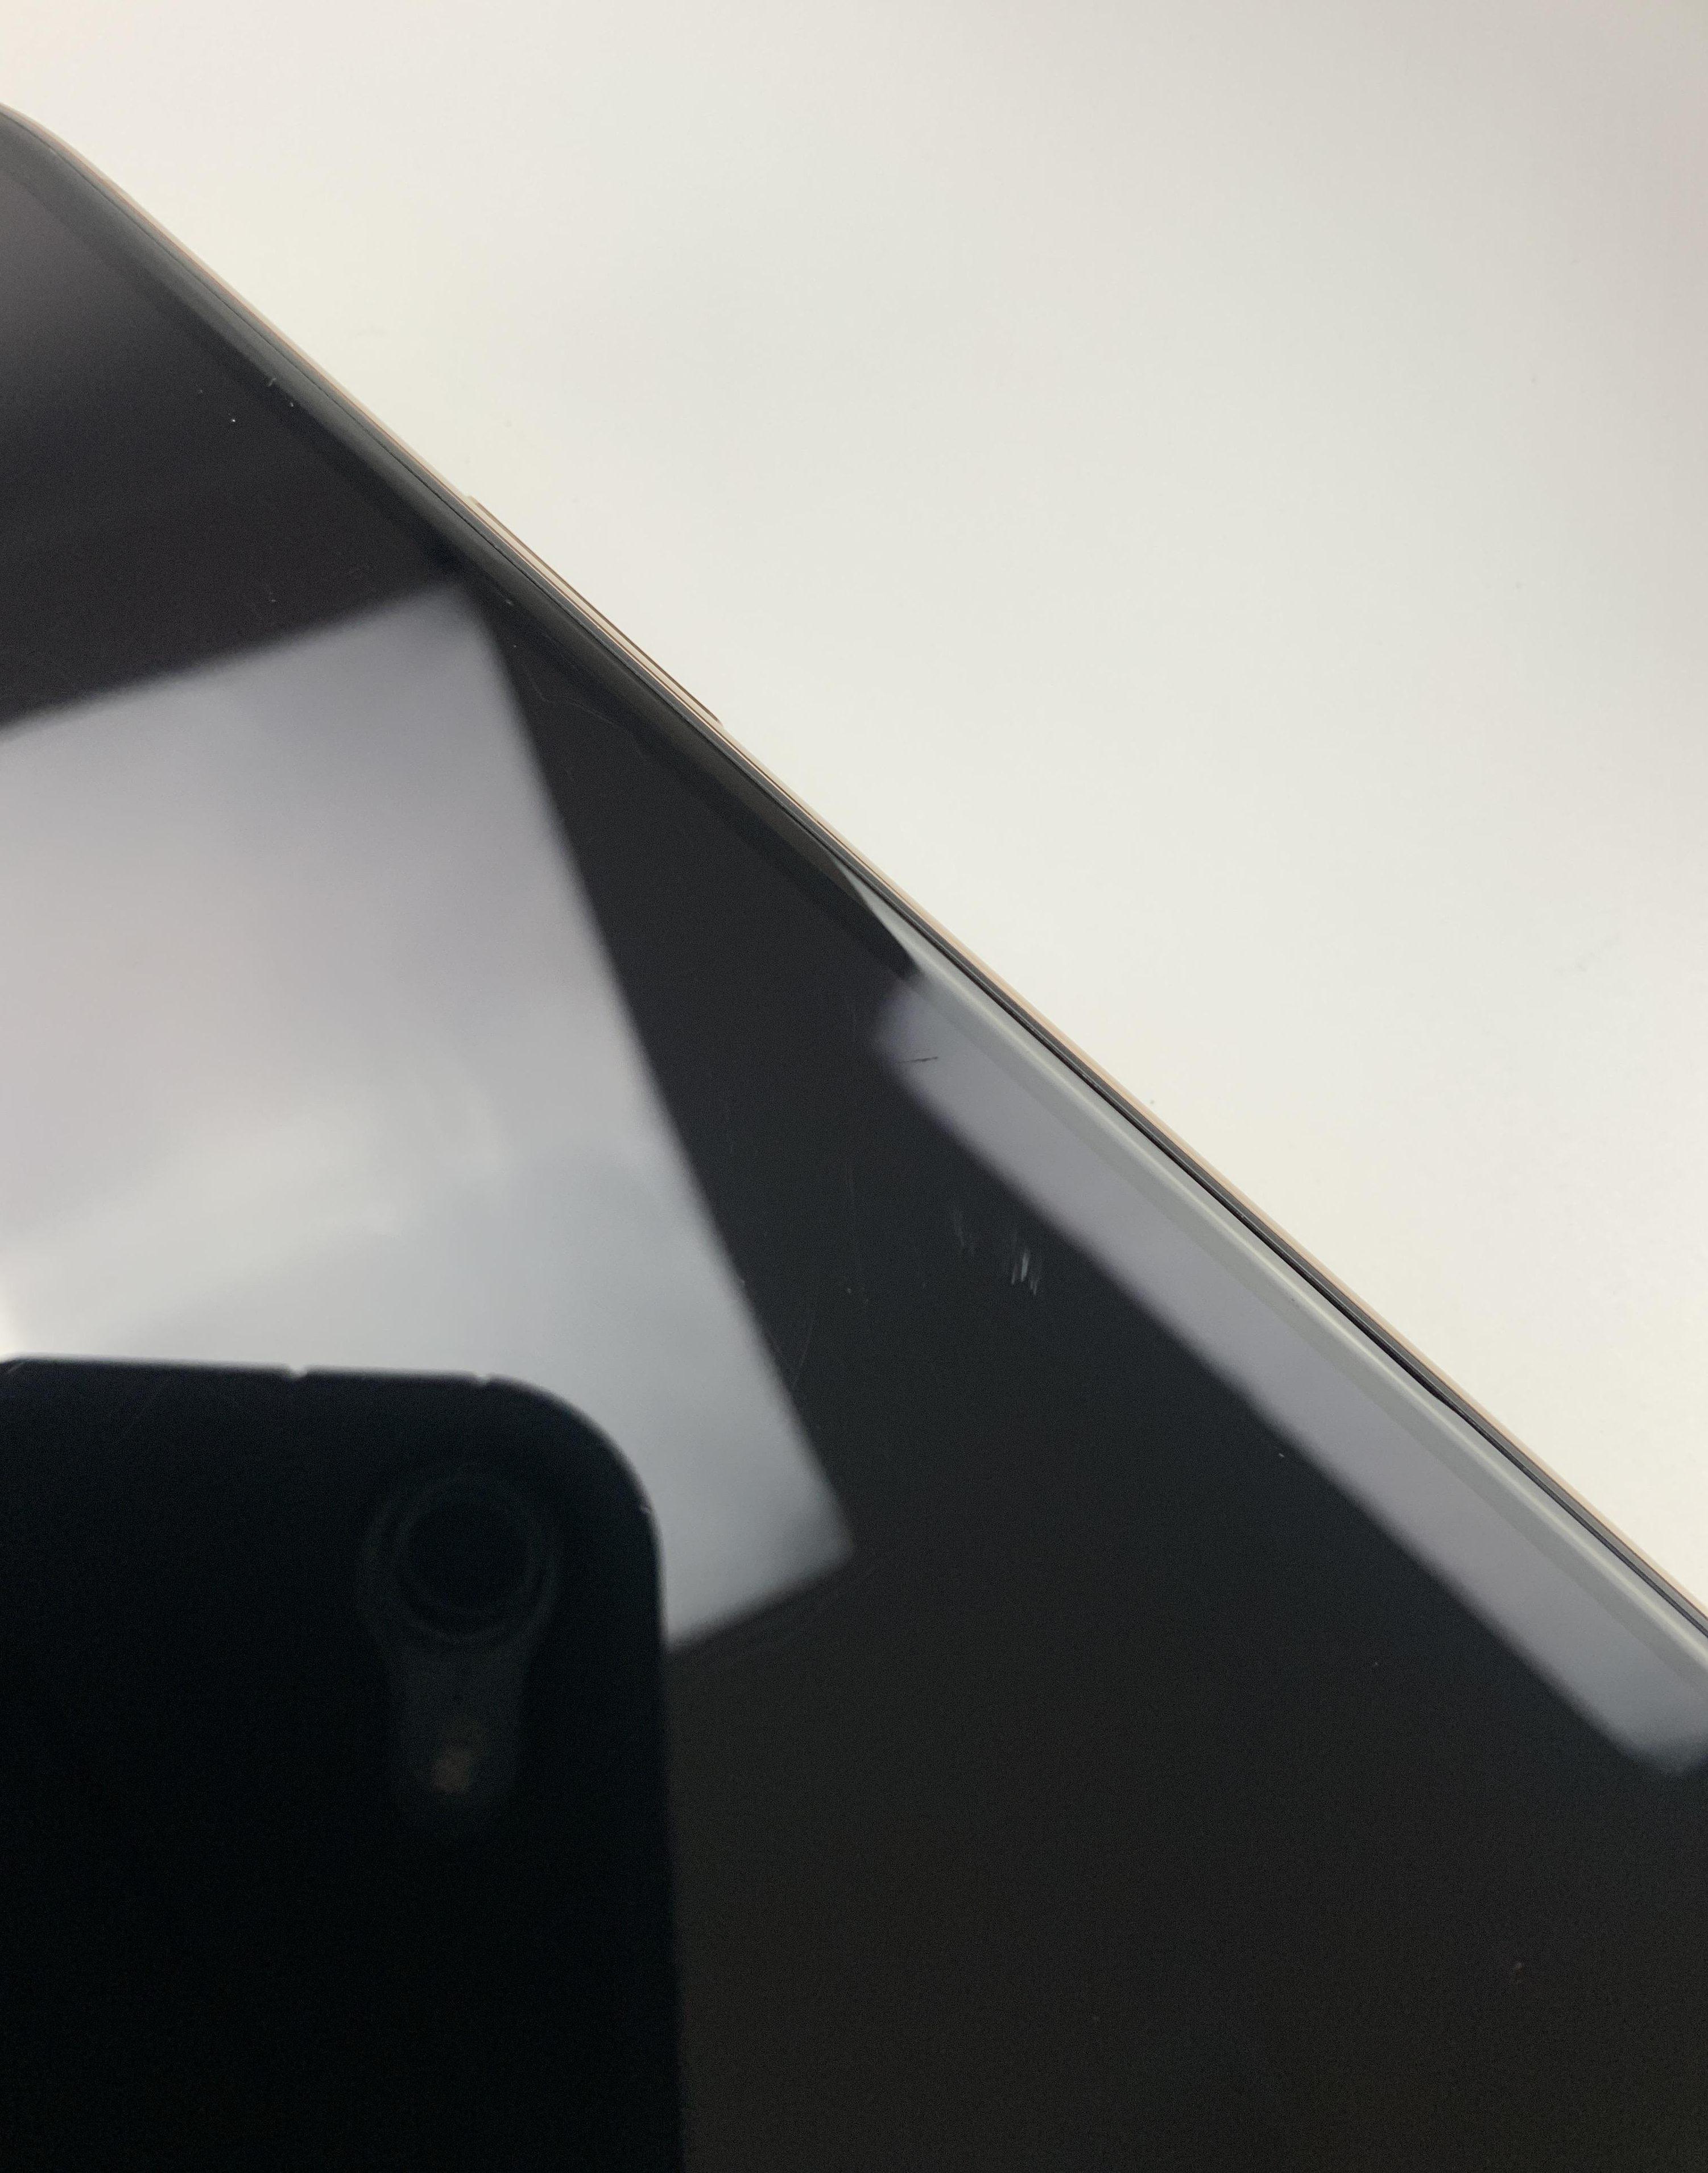 iPhone 11 Pro 256GB, 256GB, Gold, Bild 4